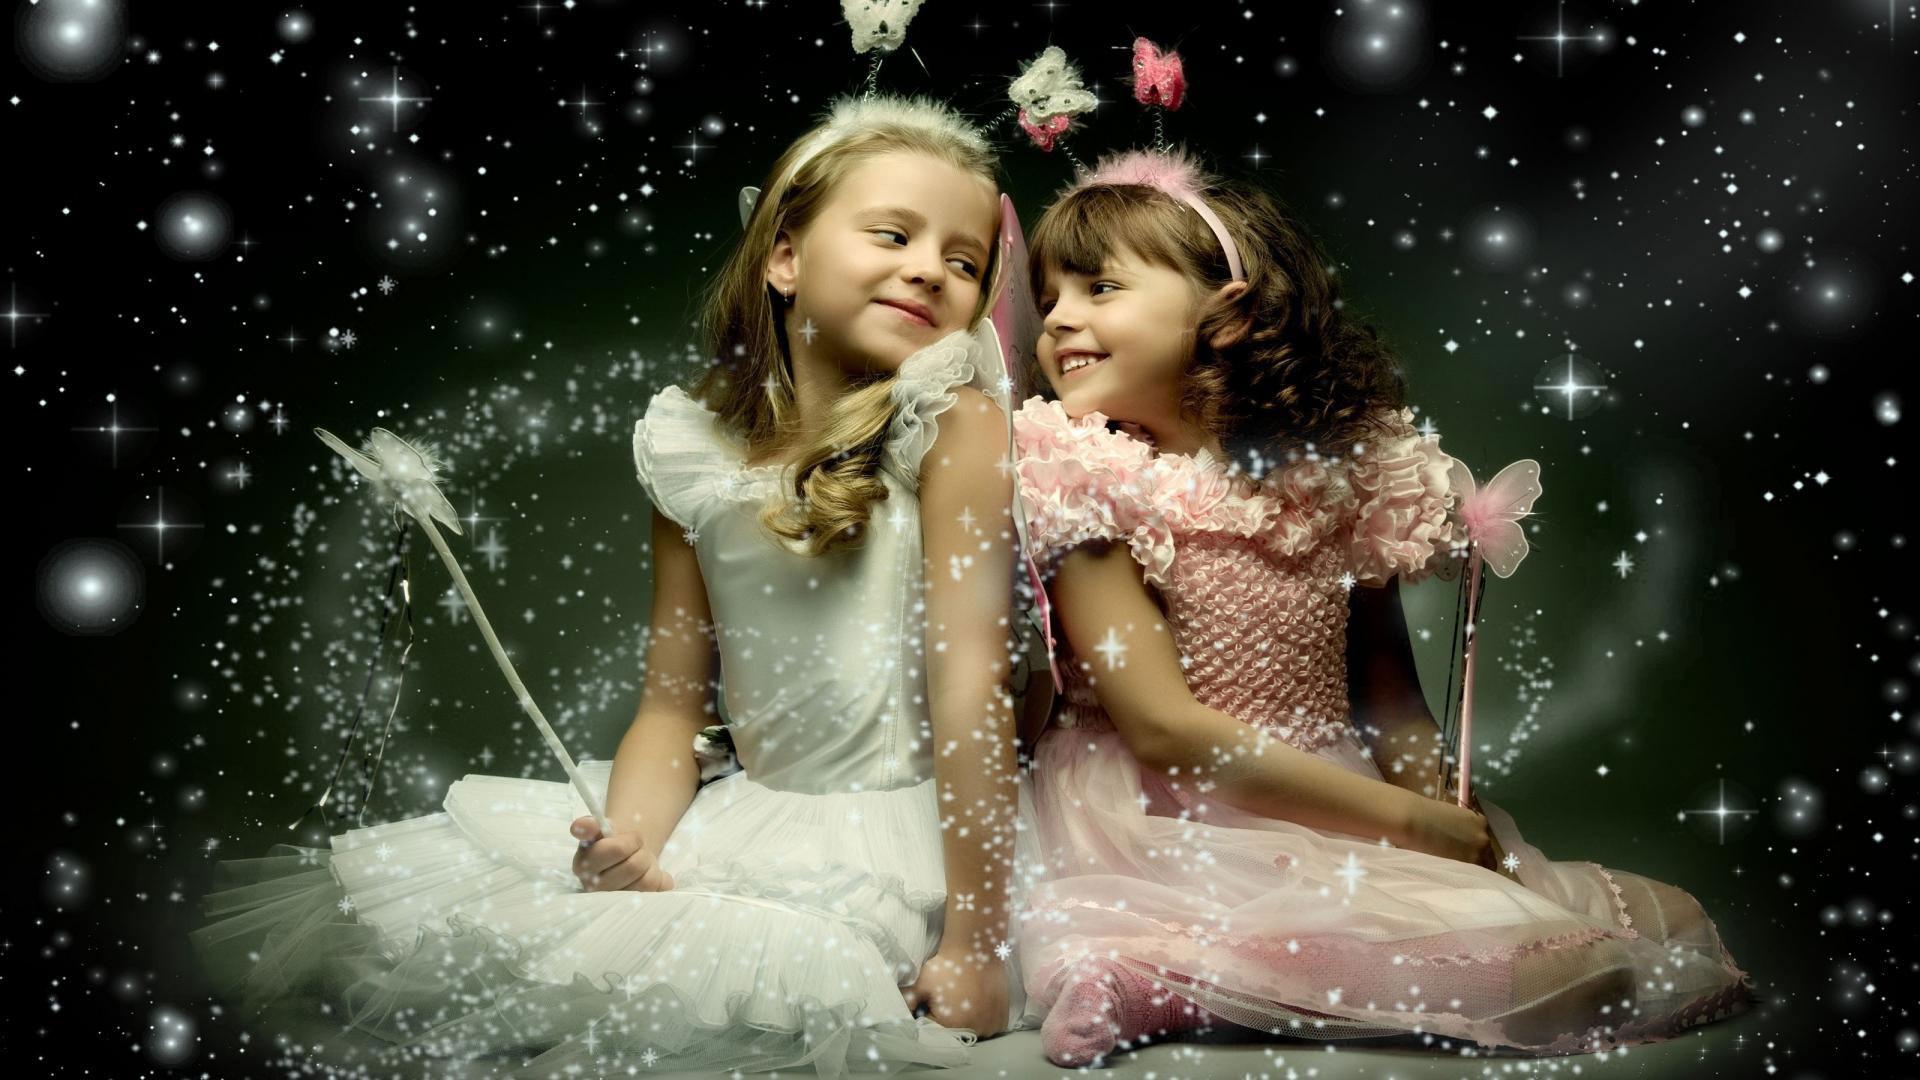 Beautiful Girl Angel HD Wallpaper   New HD Wallpapers 1920x1080